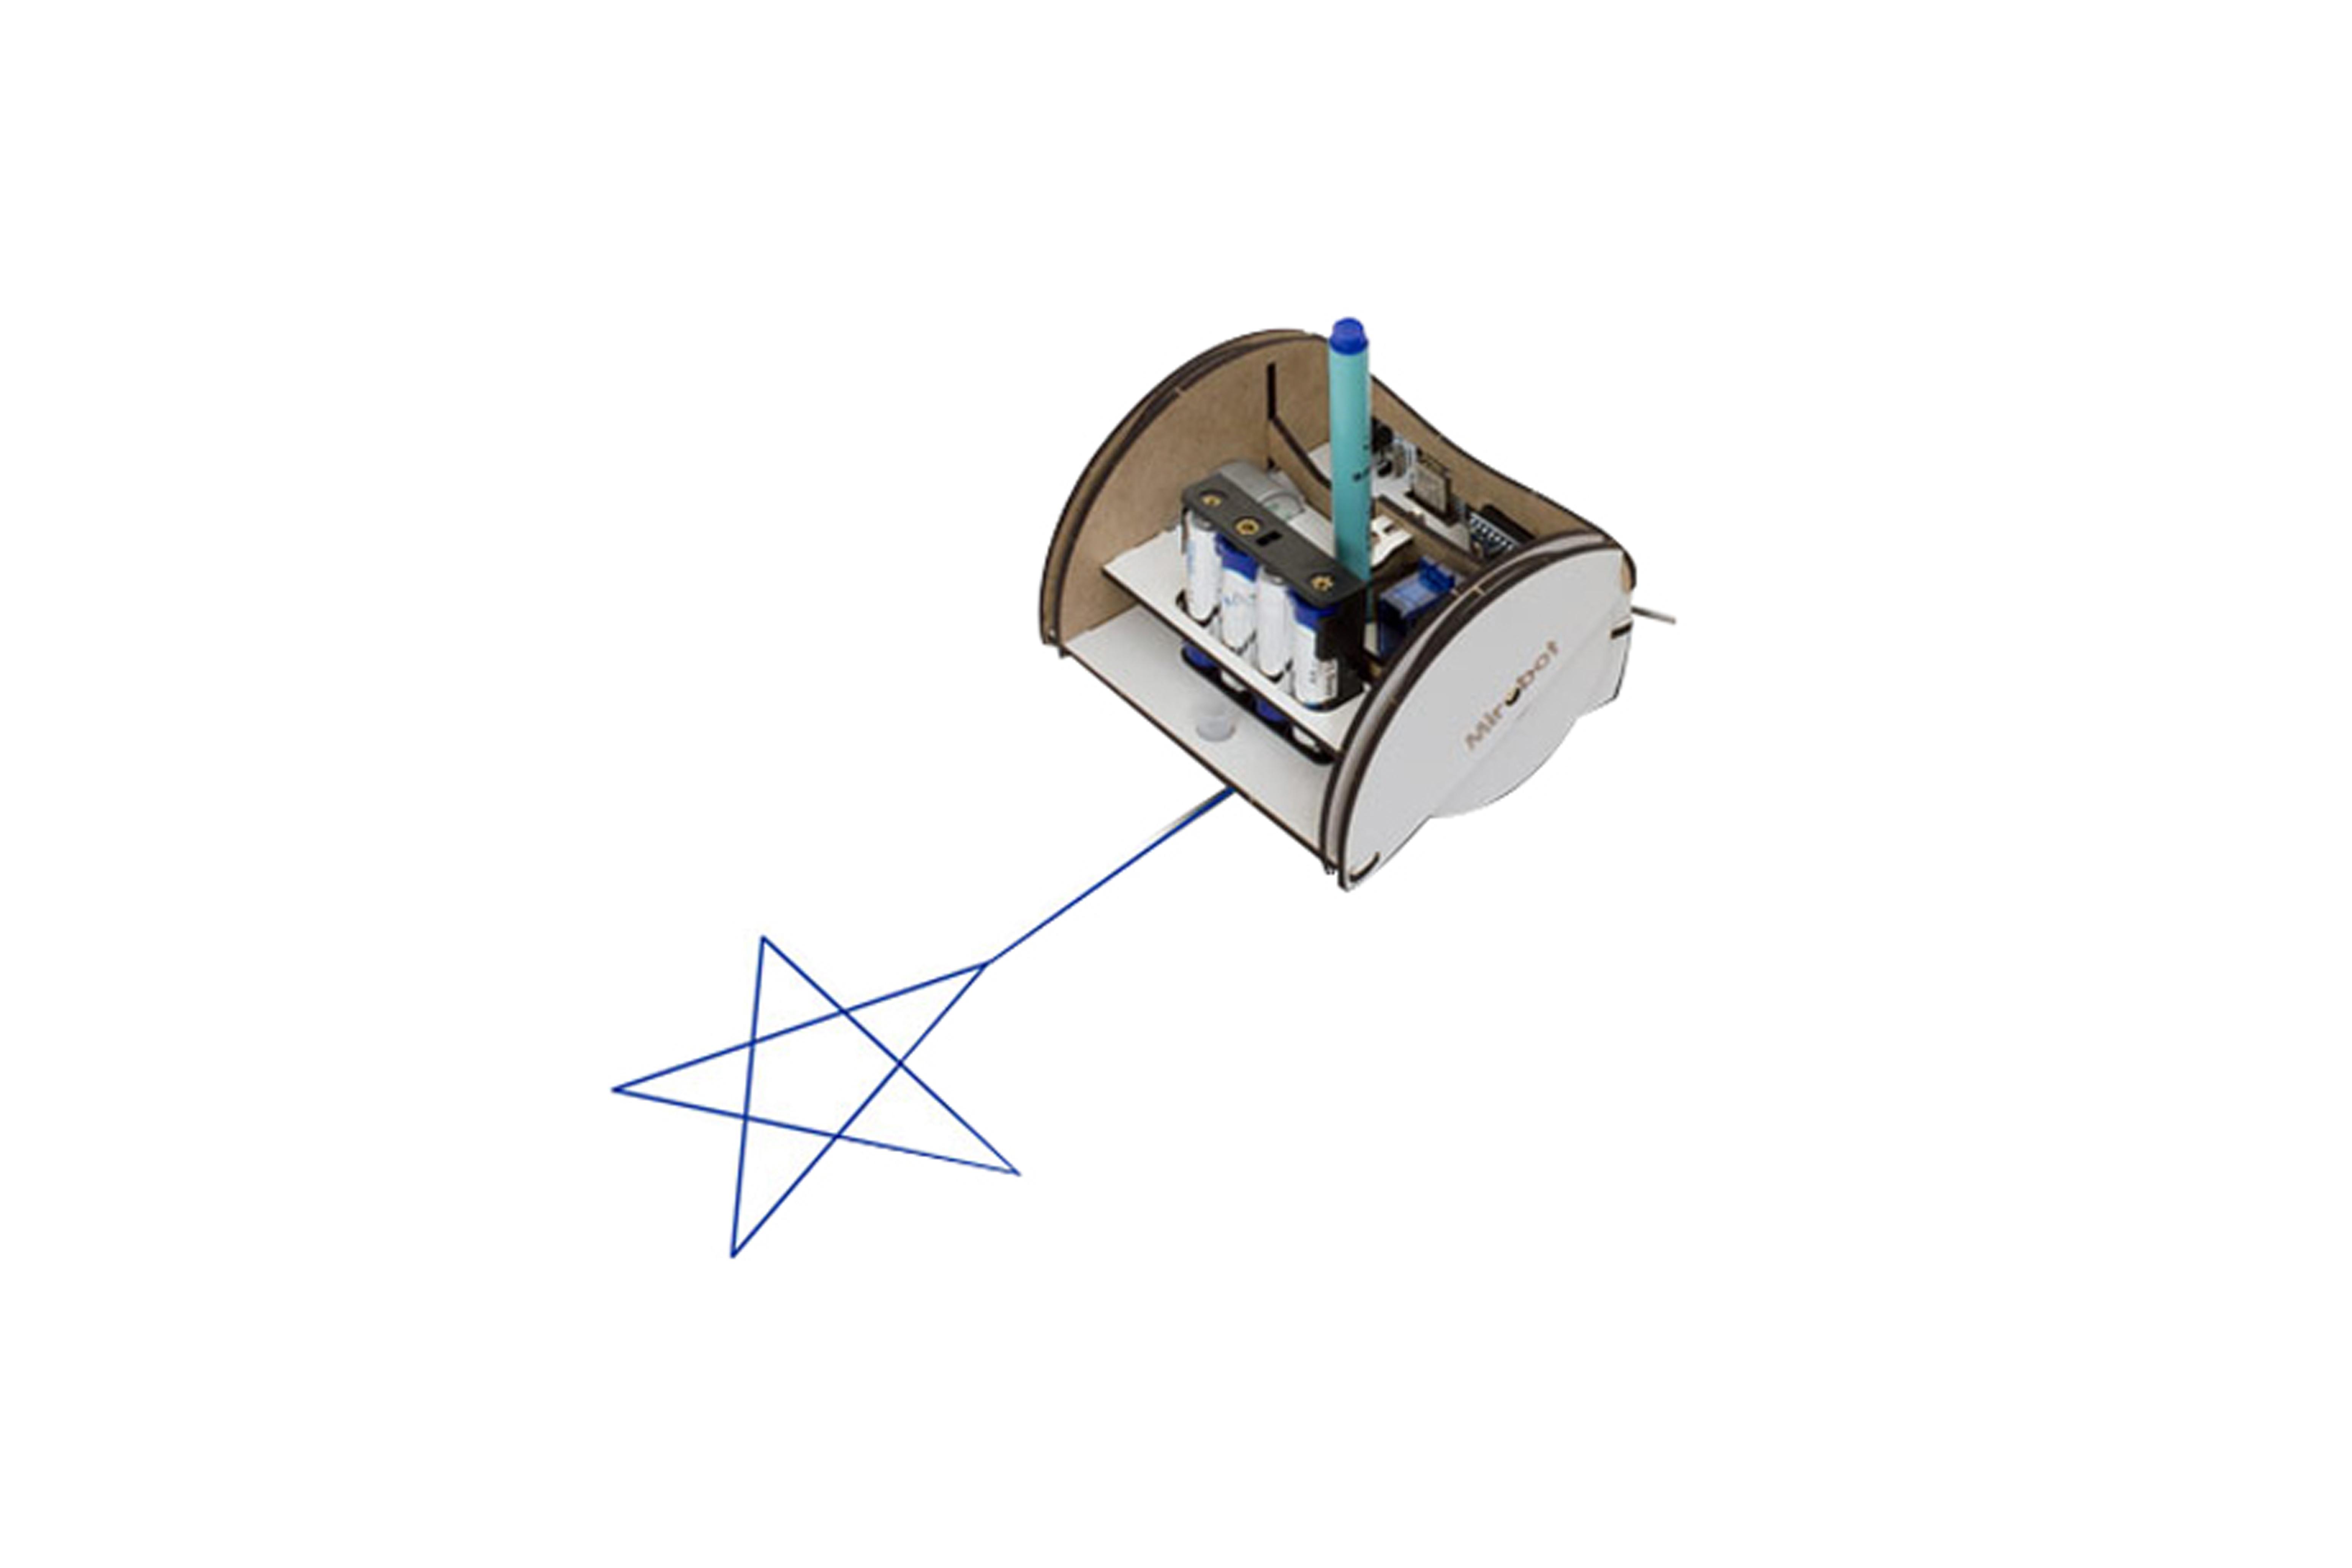 KIT ROBOT DE DESSIN MIROBOT - KIT COMPLET